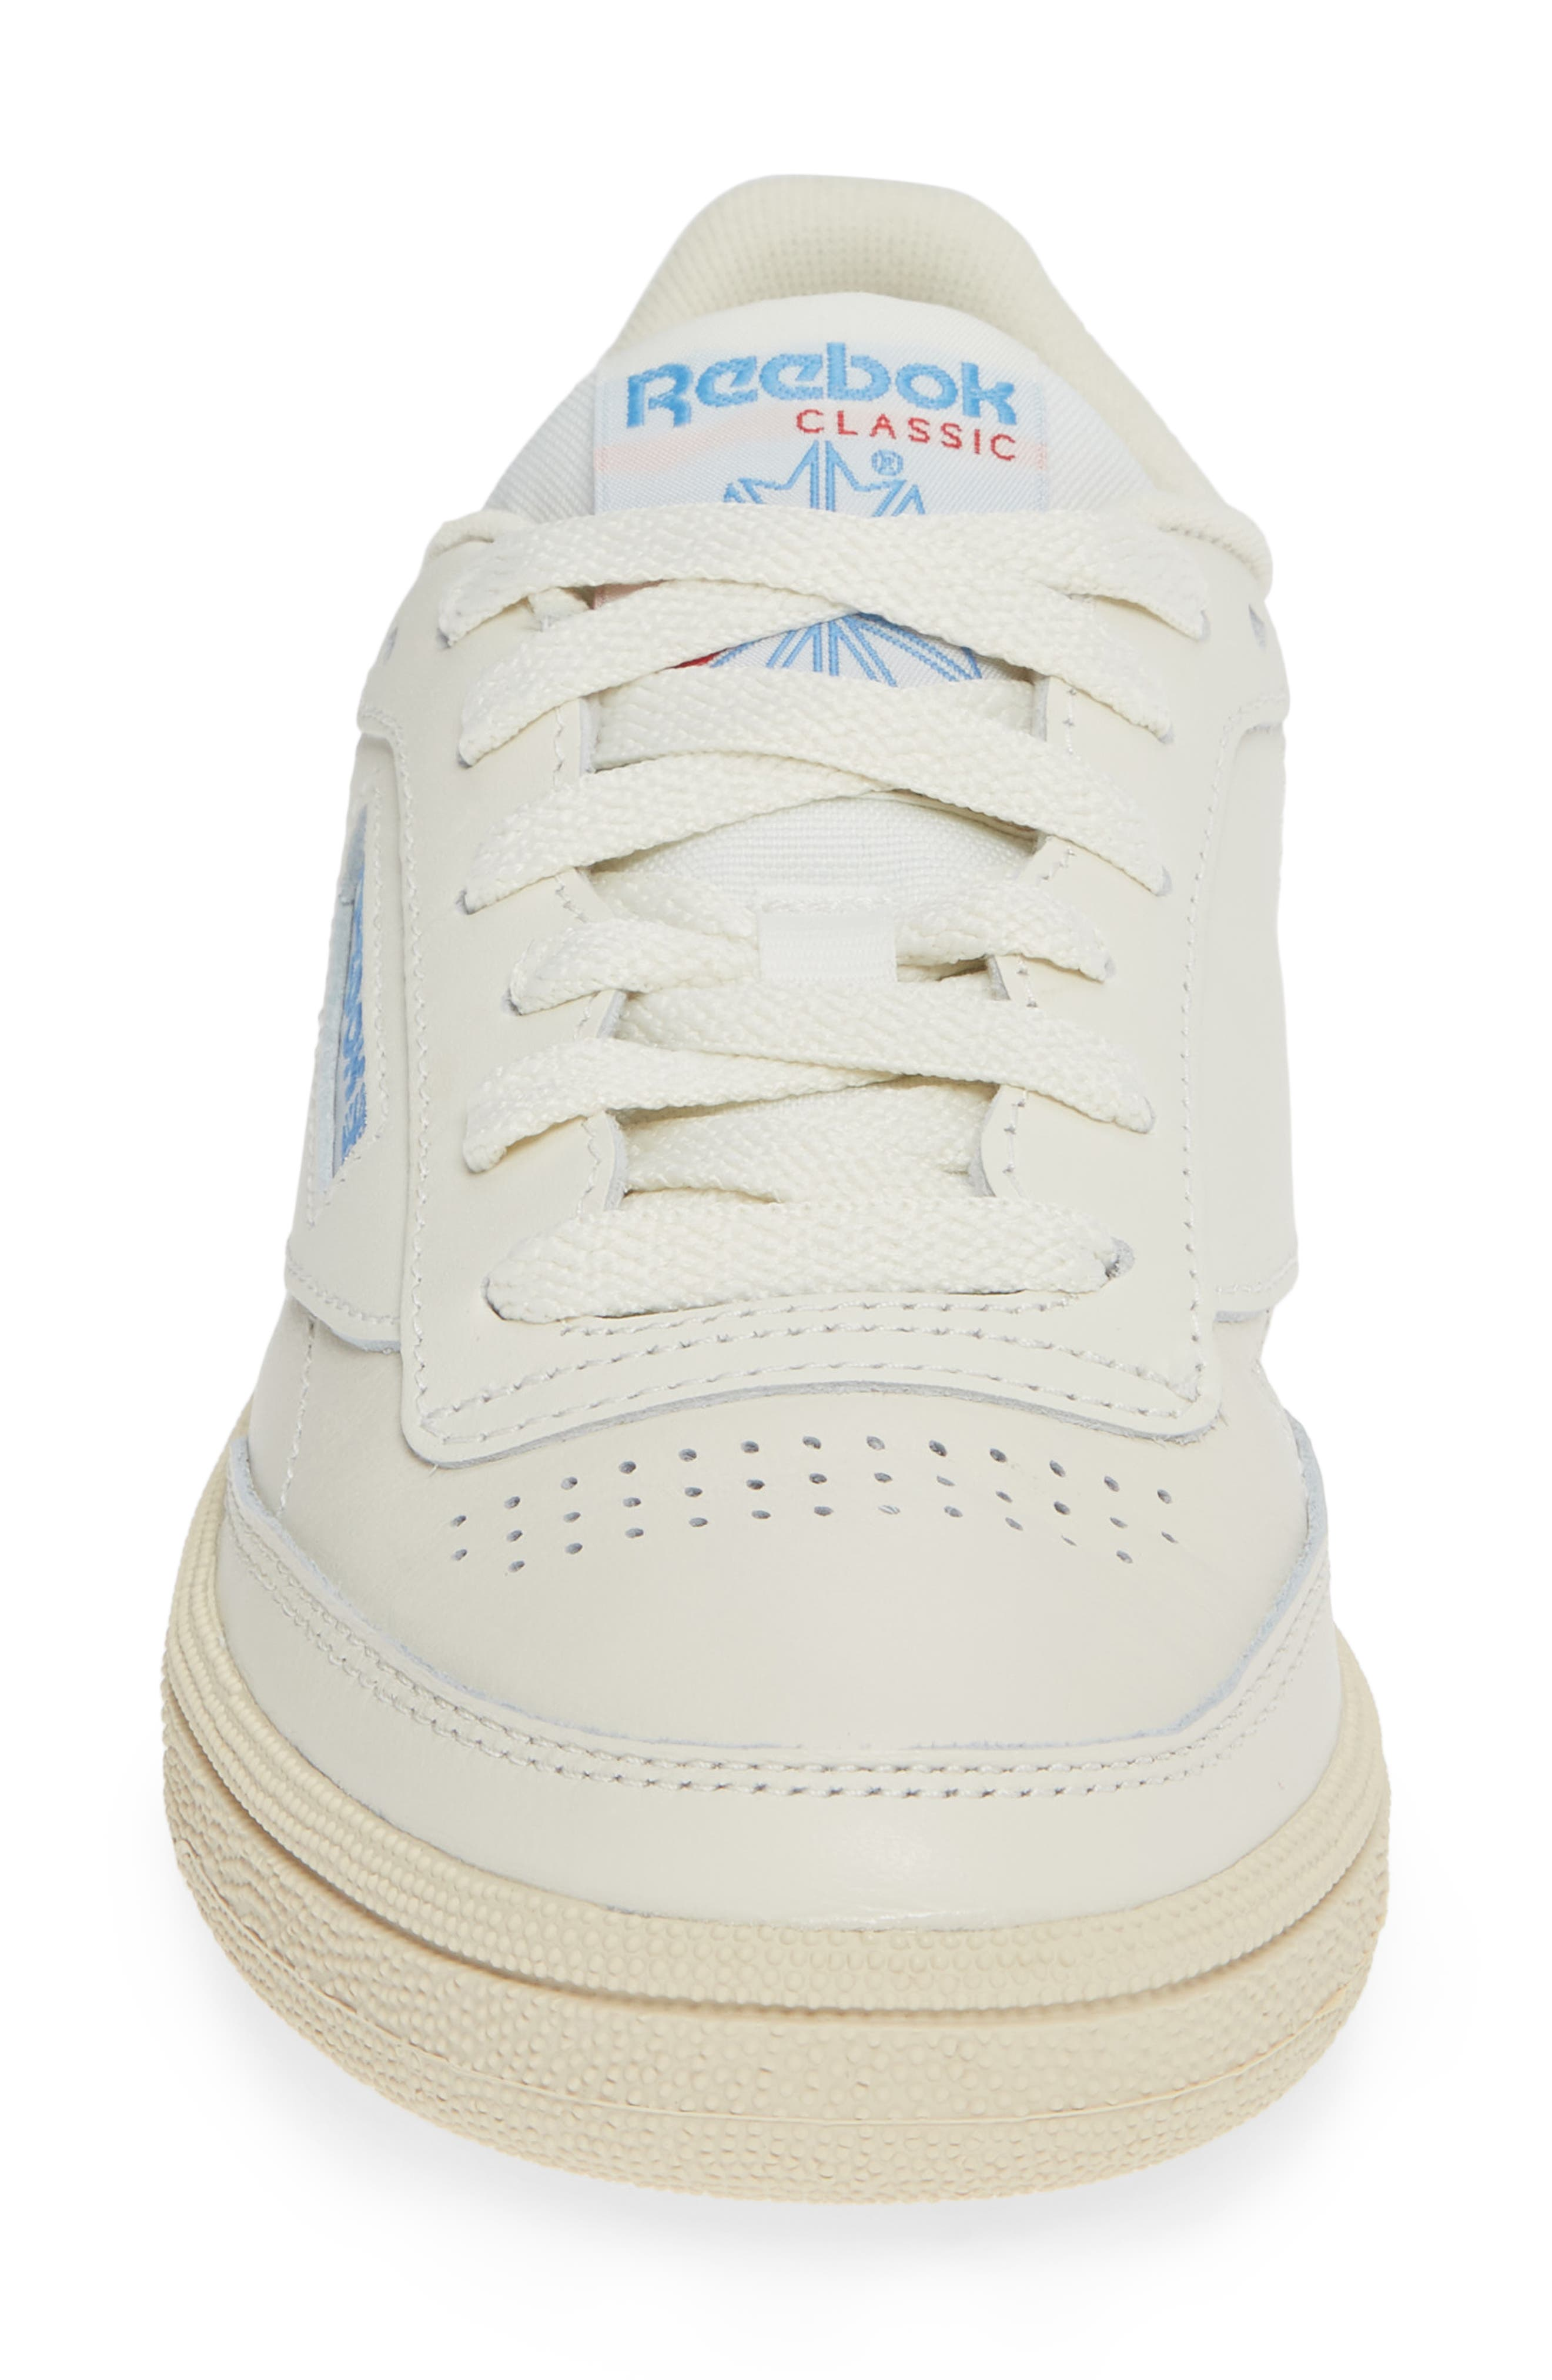 Club C 85 Sneaker,                             Alternate thumbnail 4, color,                             CHALK/ WHITE/ BLUE/ RED